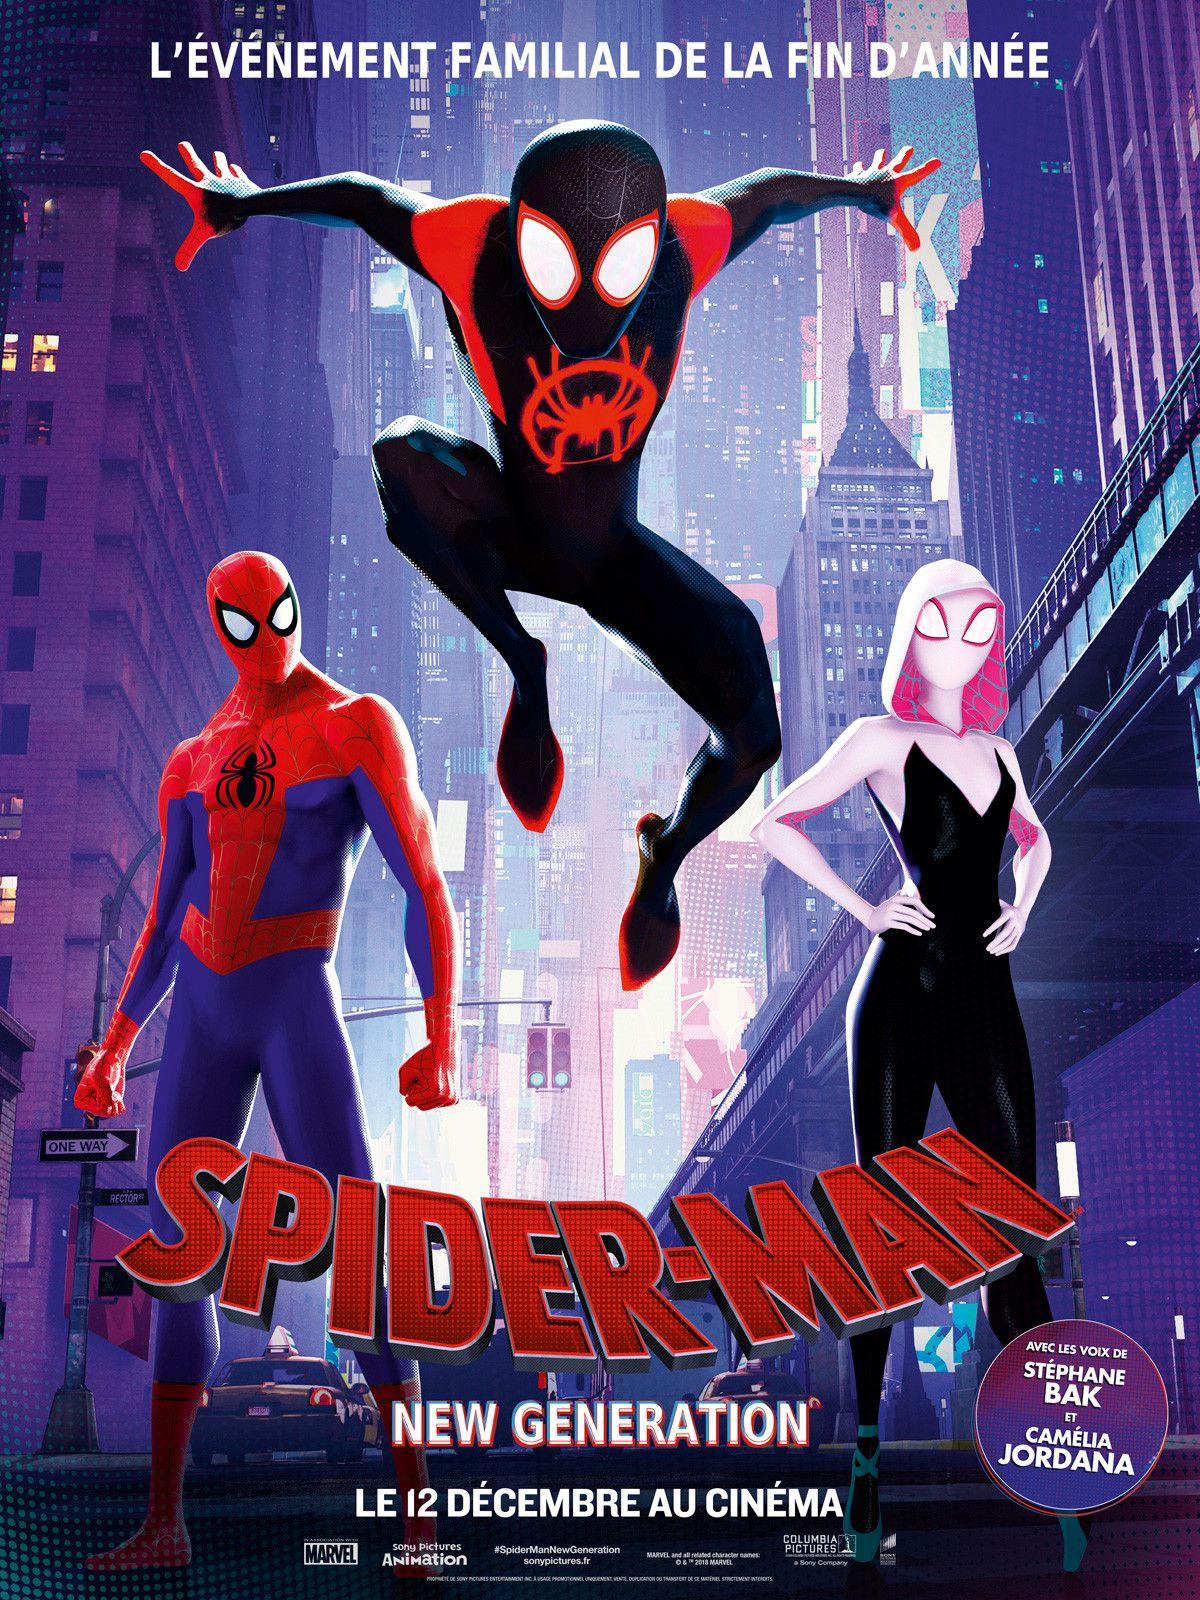 Spider Man New Generation Suit Les Aventures De Miles Morales Un Adolescent Afro Americain Et Portoricain Qui Vit A Brooklyn En 2020 Spiderman Film Spider Man Film